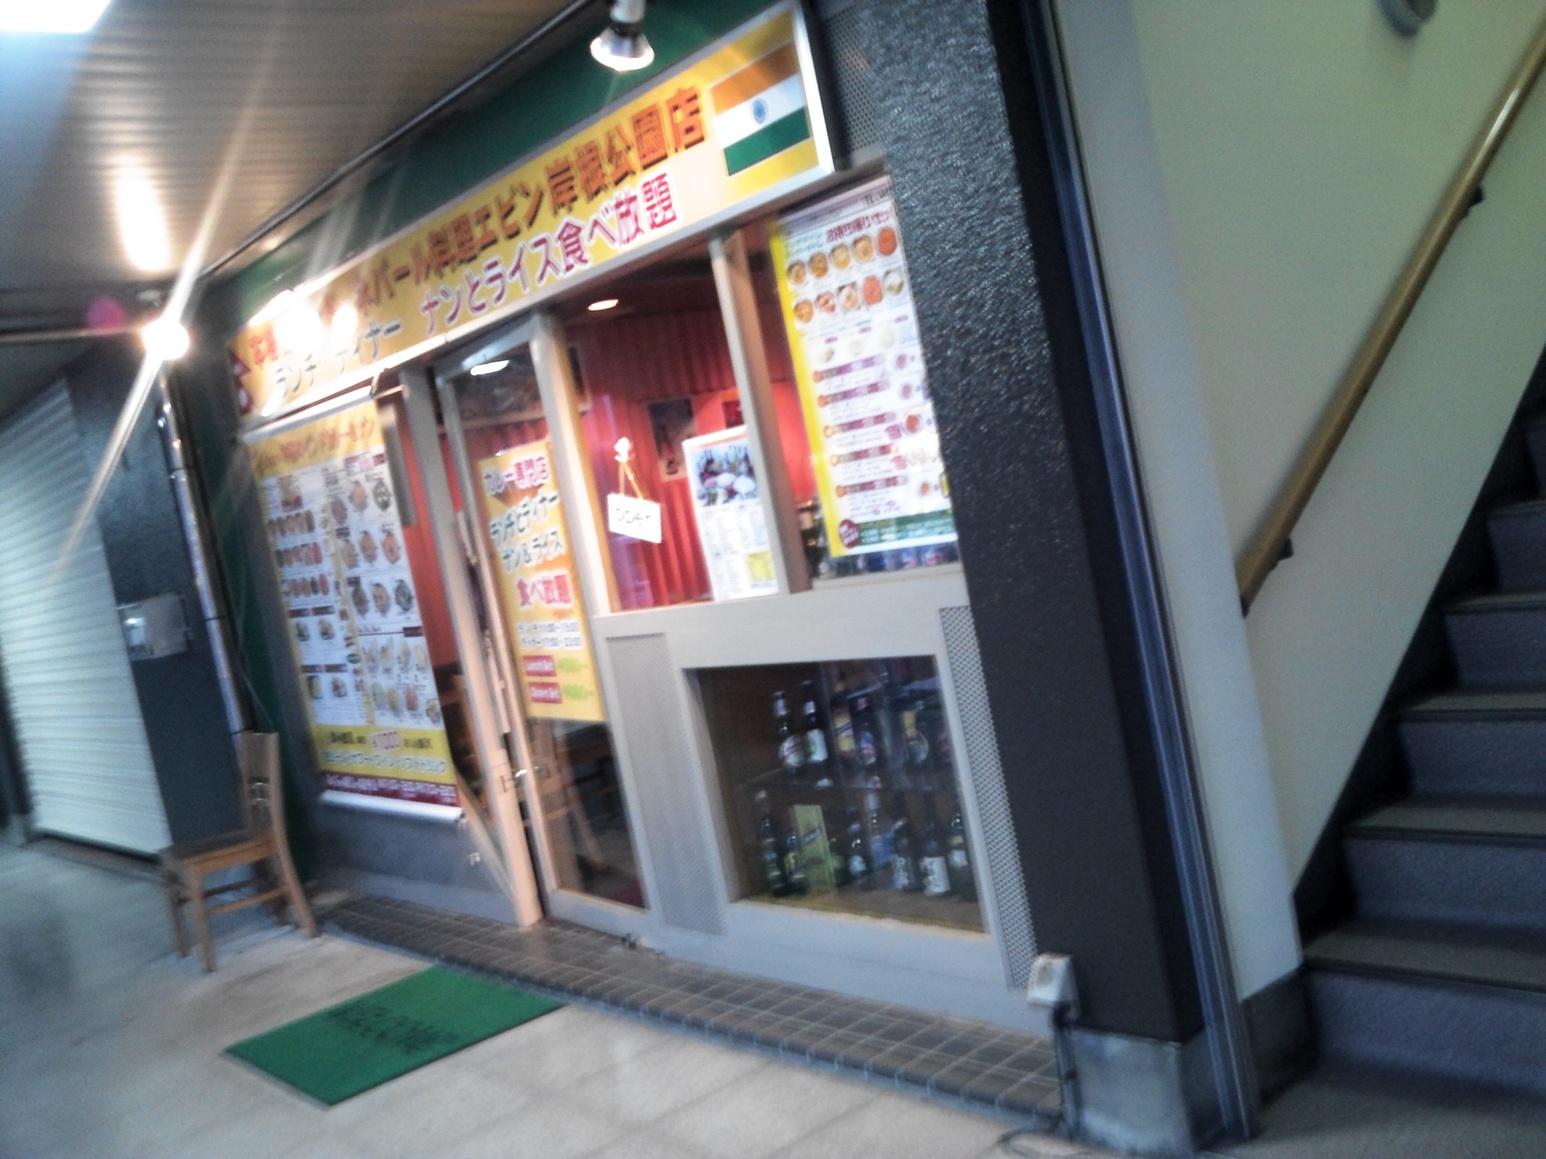 yabin 岸根公園店